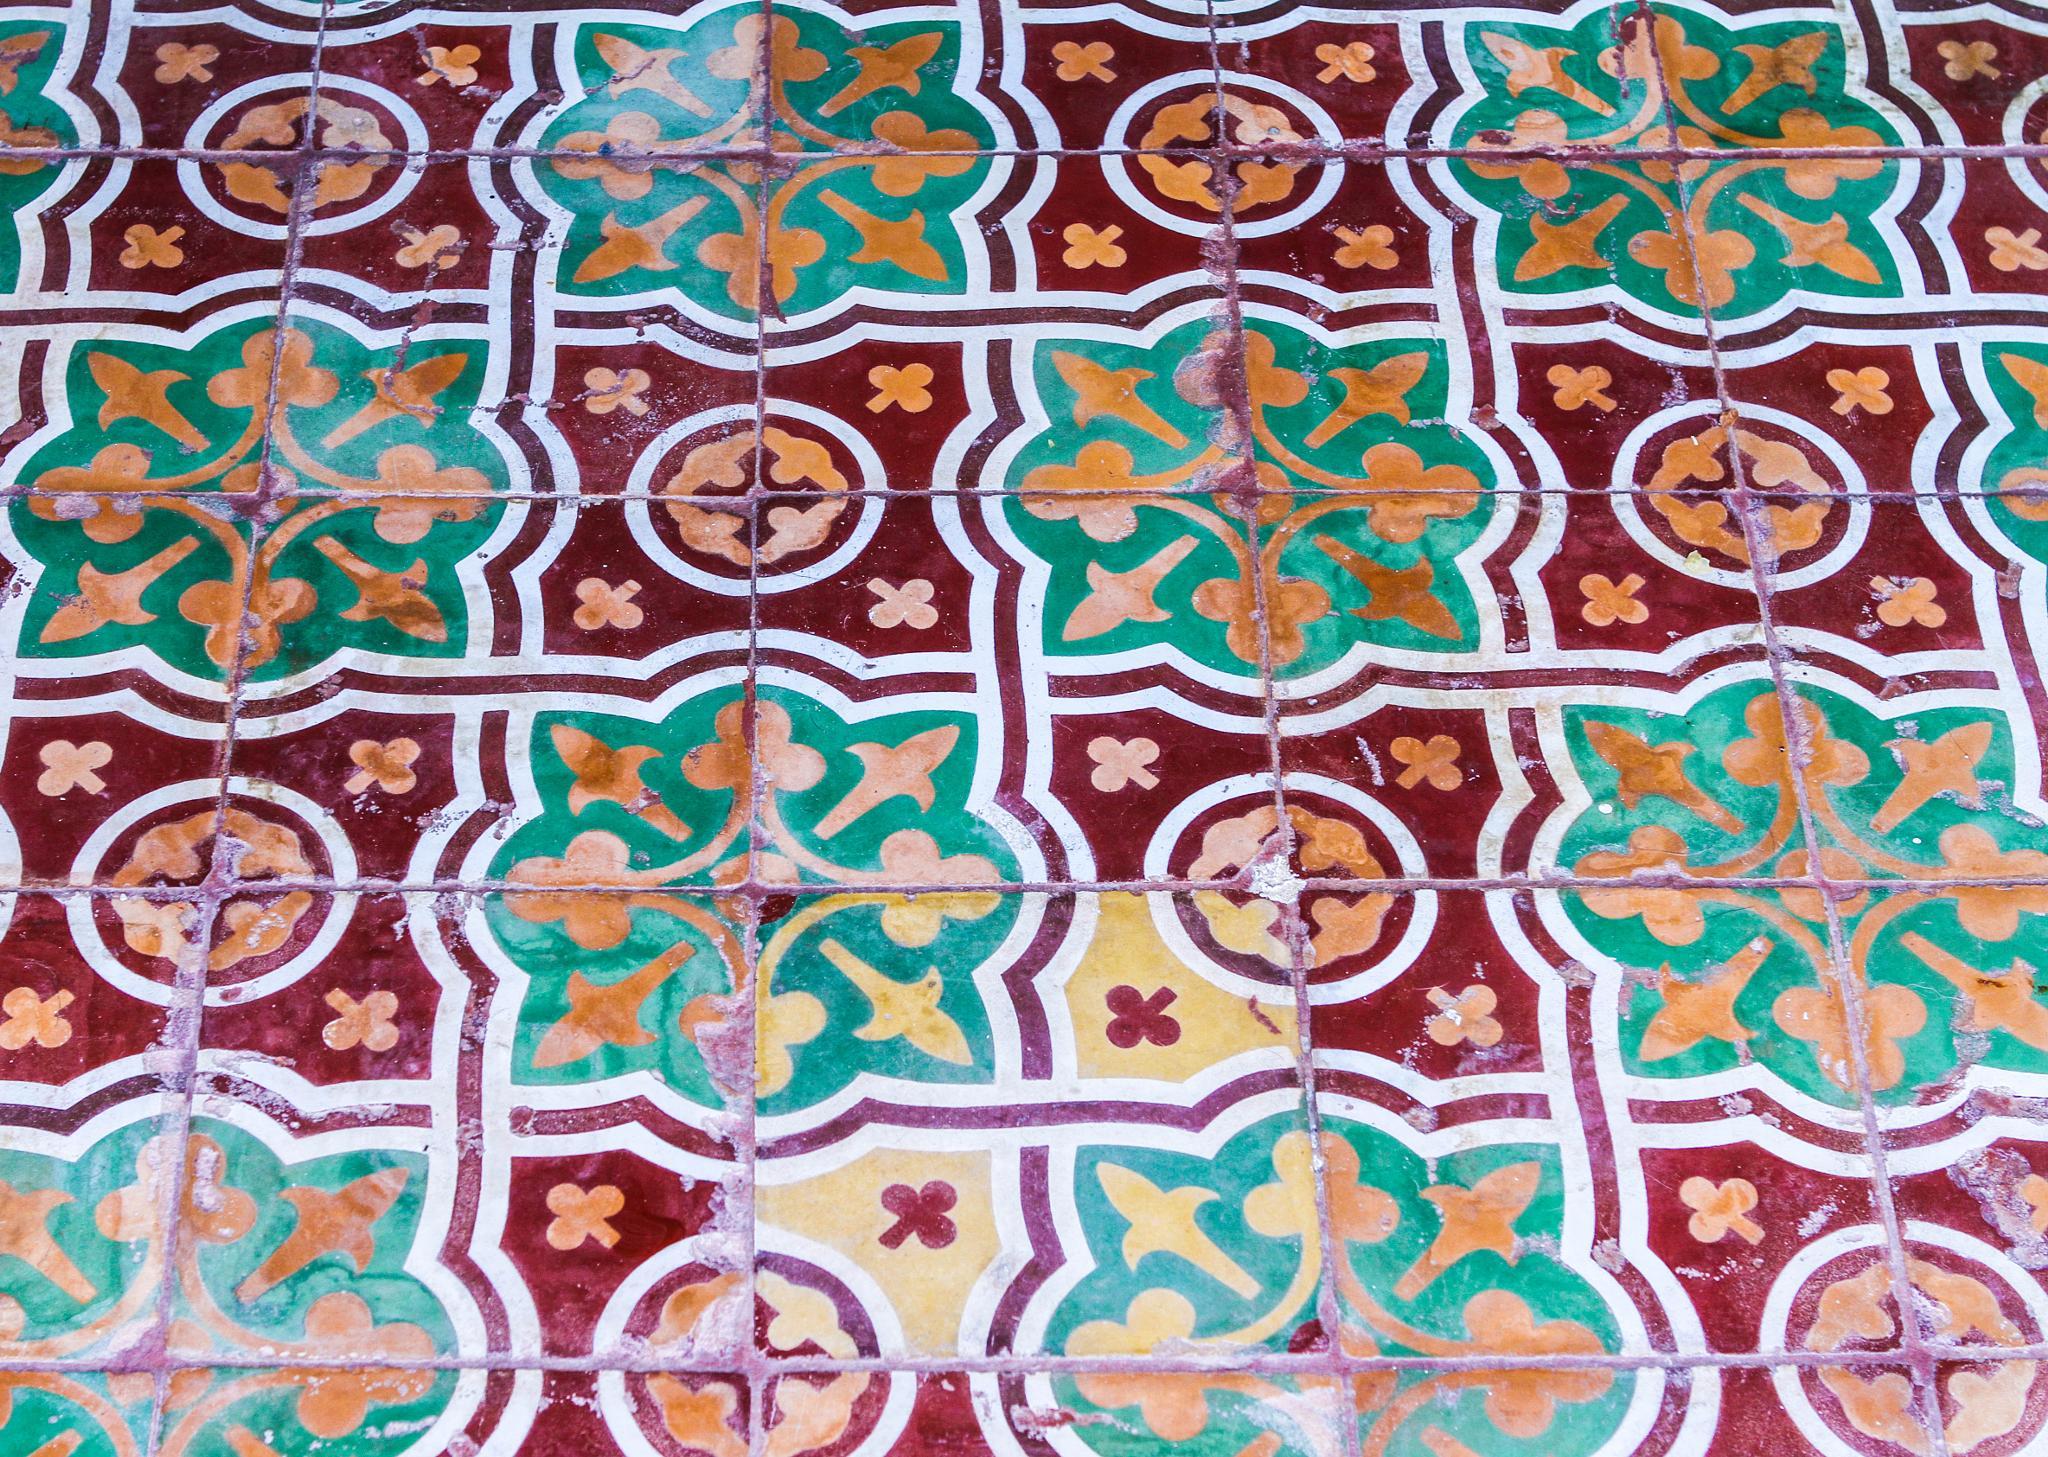 Old tiles by vasilis fragiskatos